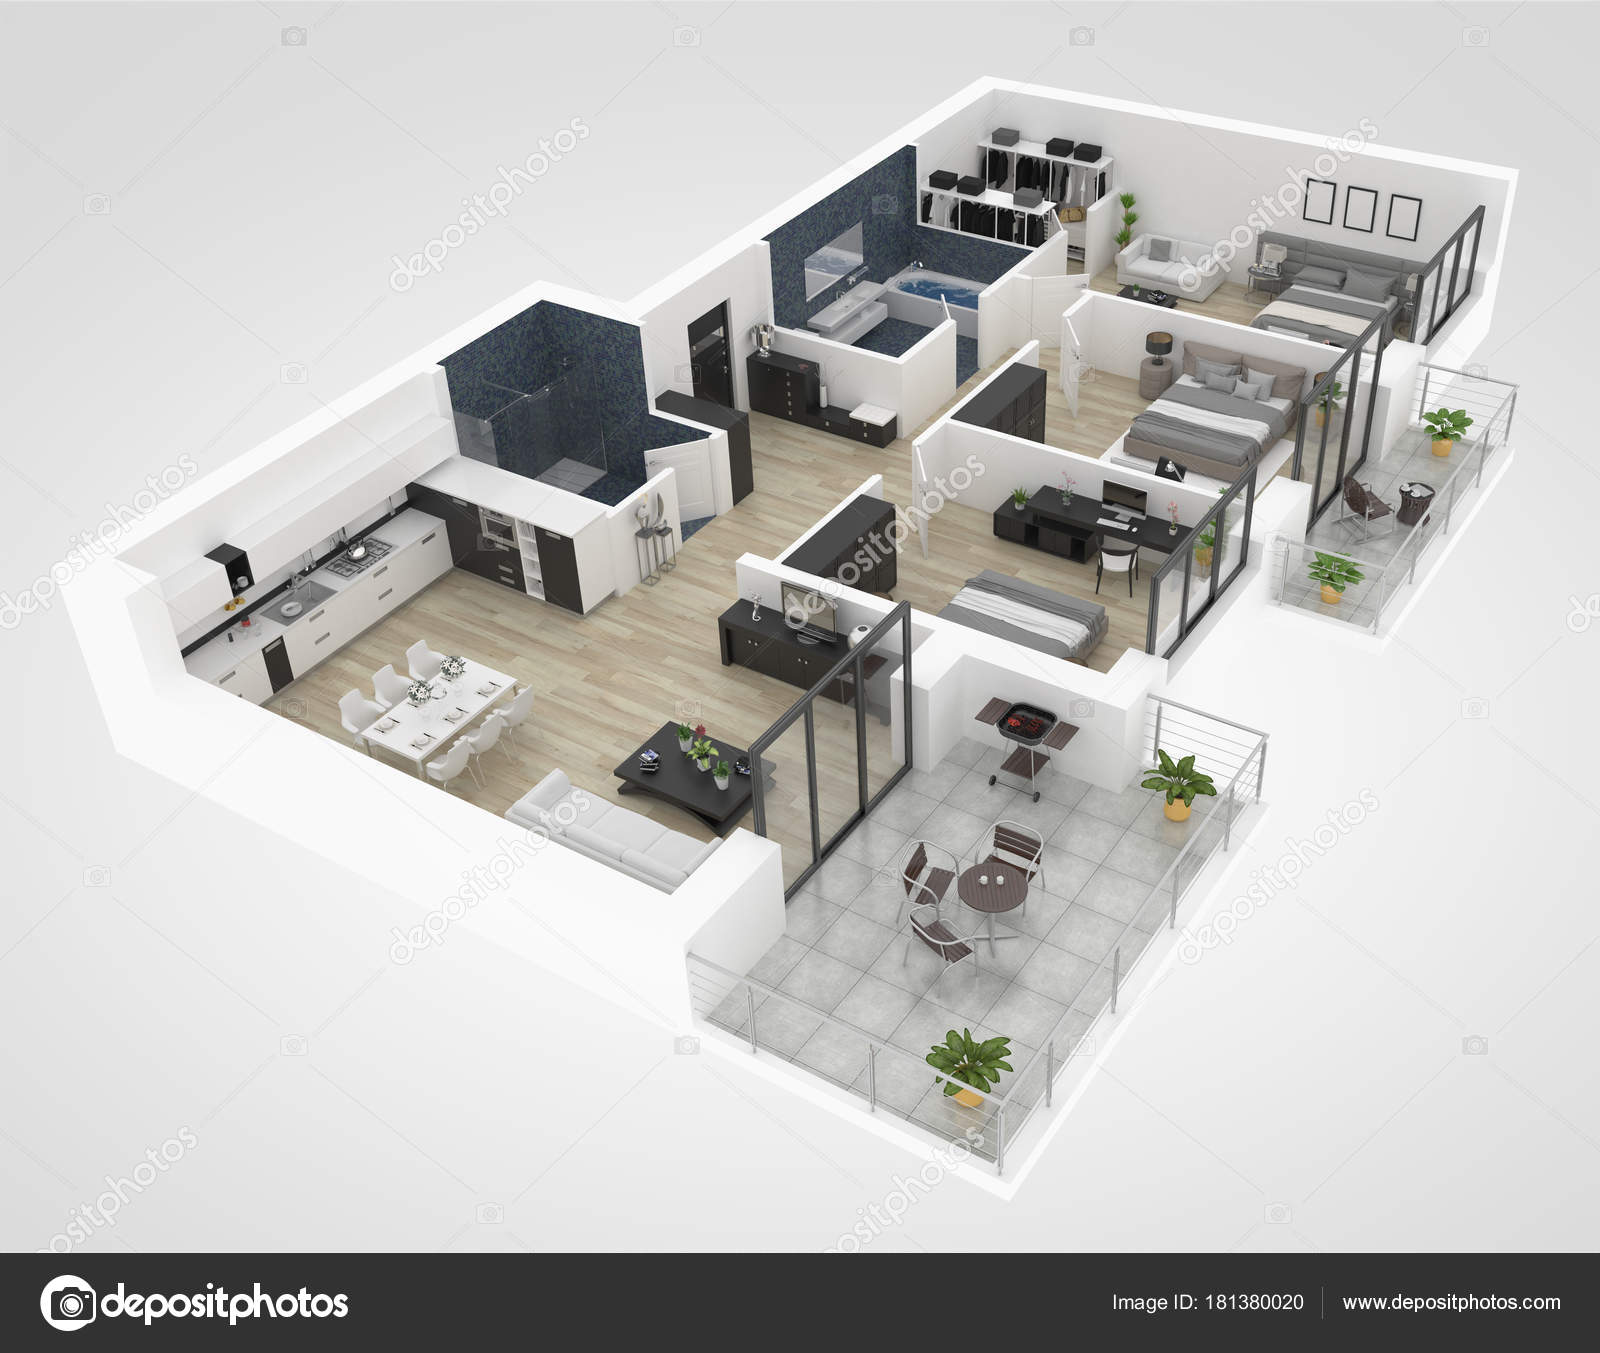 Floor Plan House Top View Illustration Open Concept Living